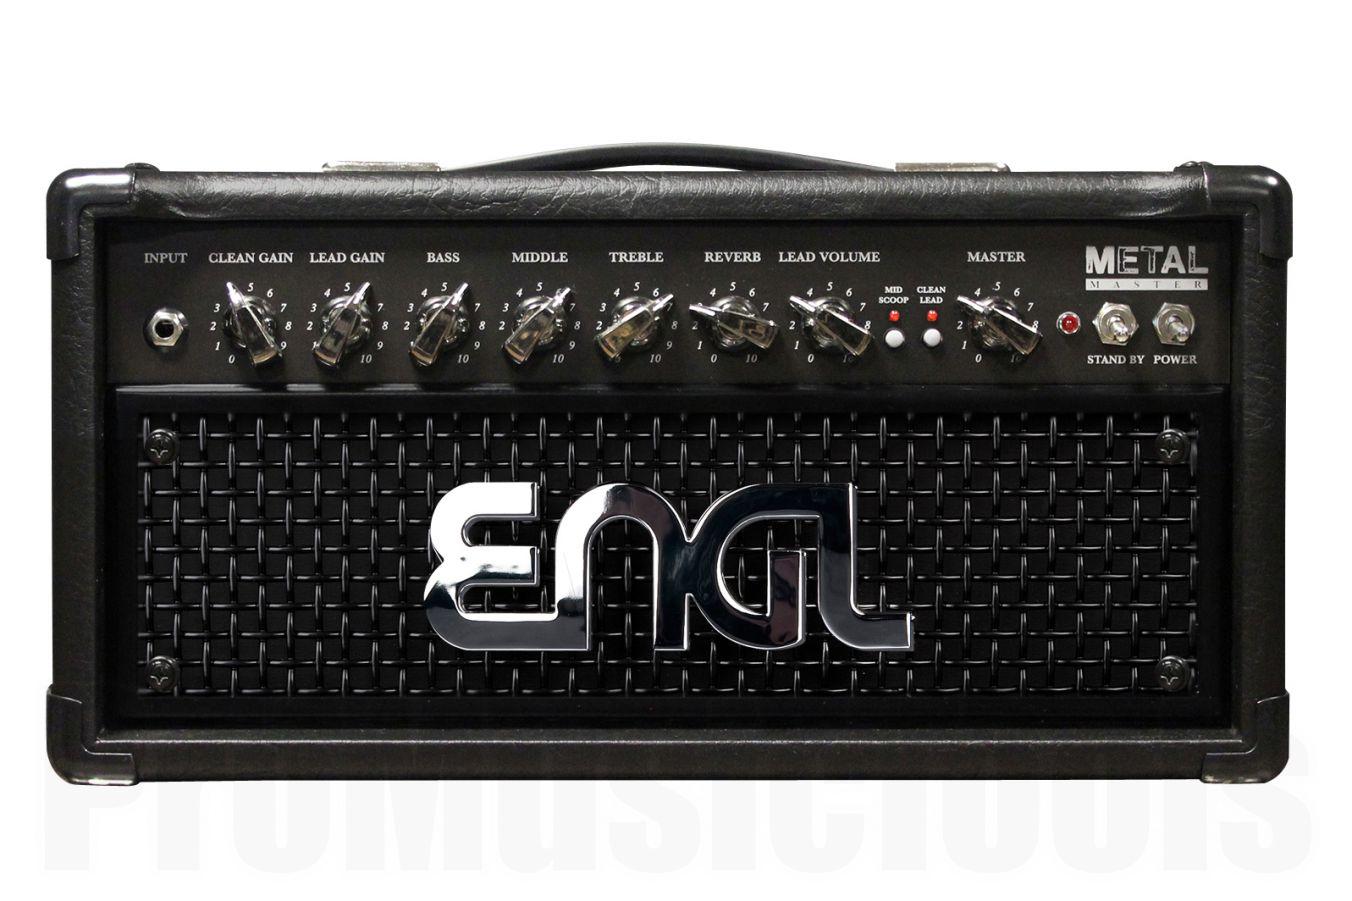 Engl Metalmaster 20 Head E309 - b-stock (1x opened box)